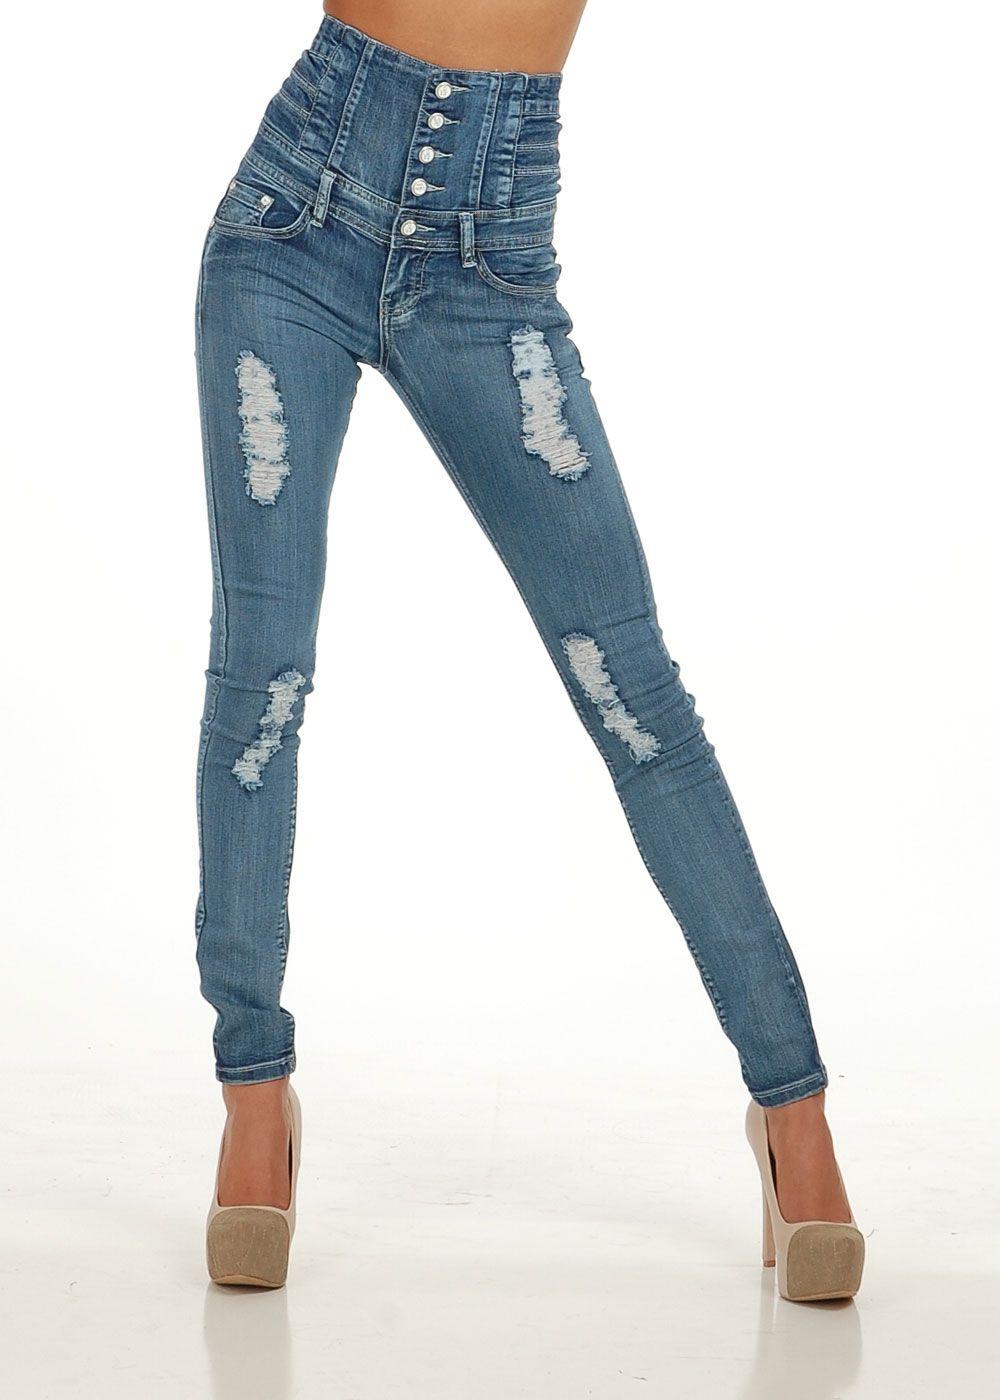 Cute Butt Jeans